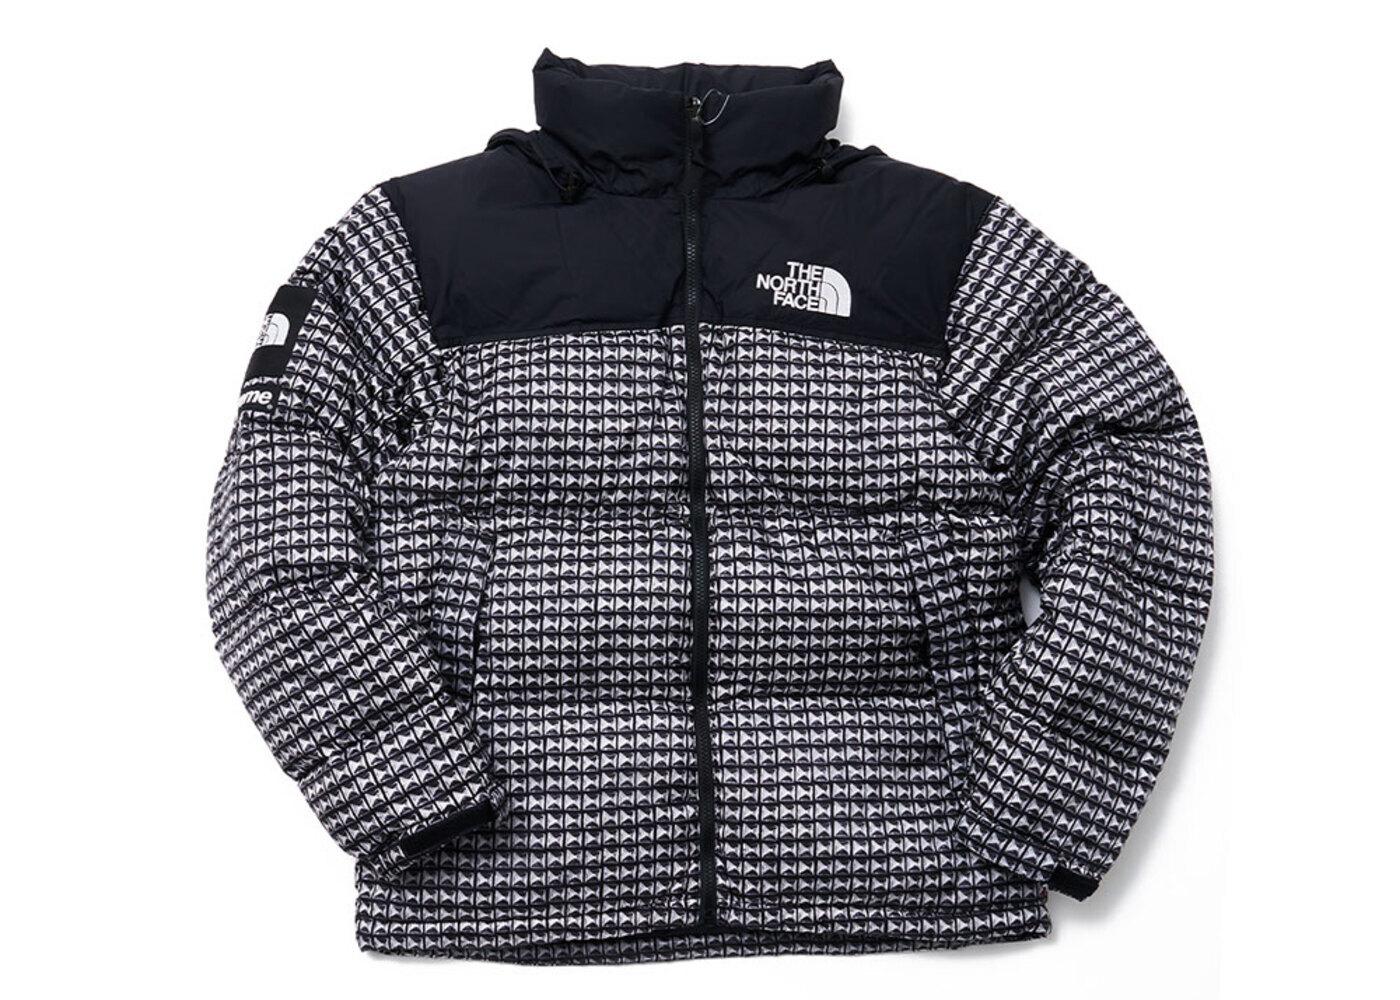 Supreme The North Face Studded Nuptse Jacket Black (SS21)の写真